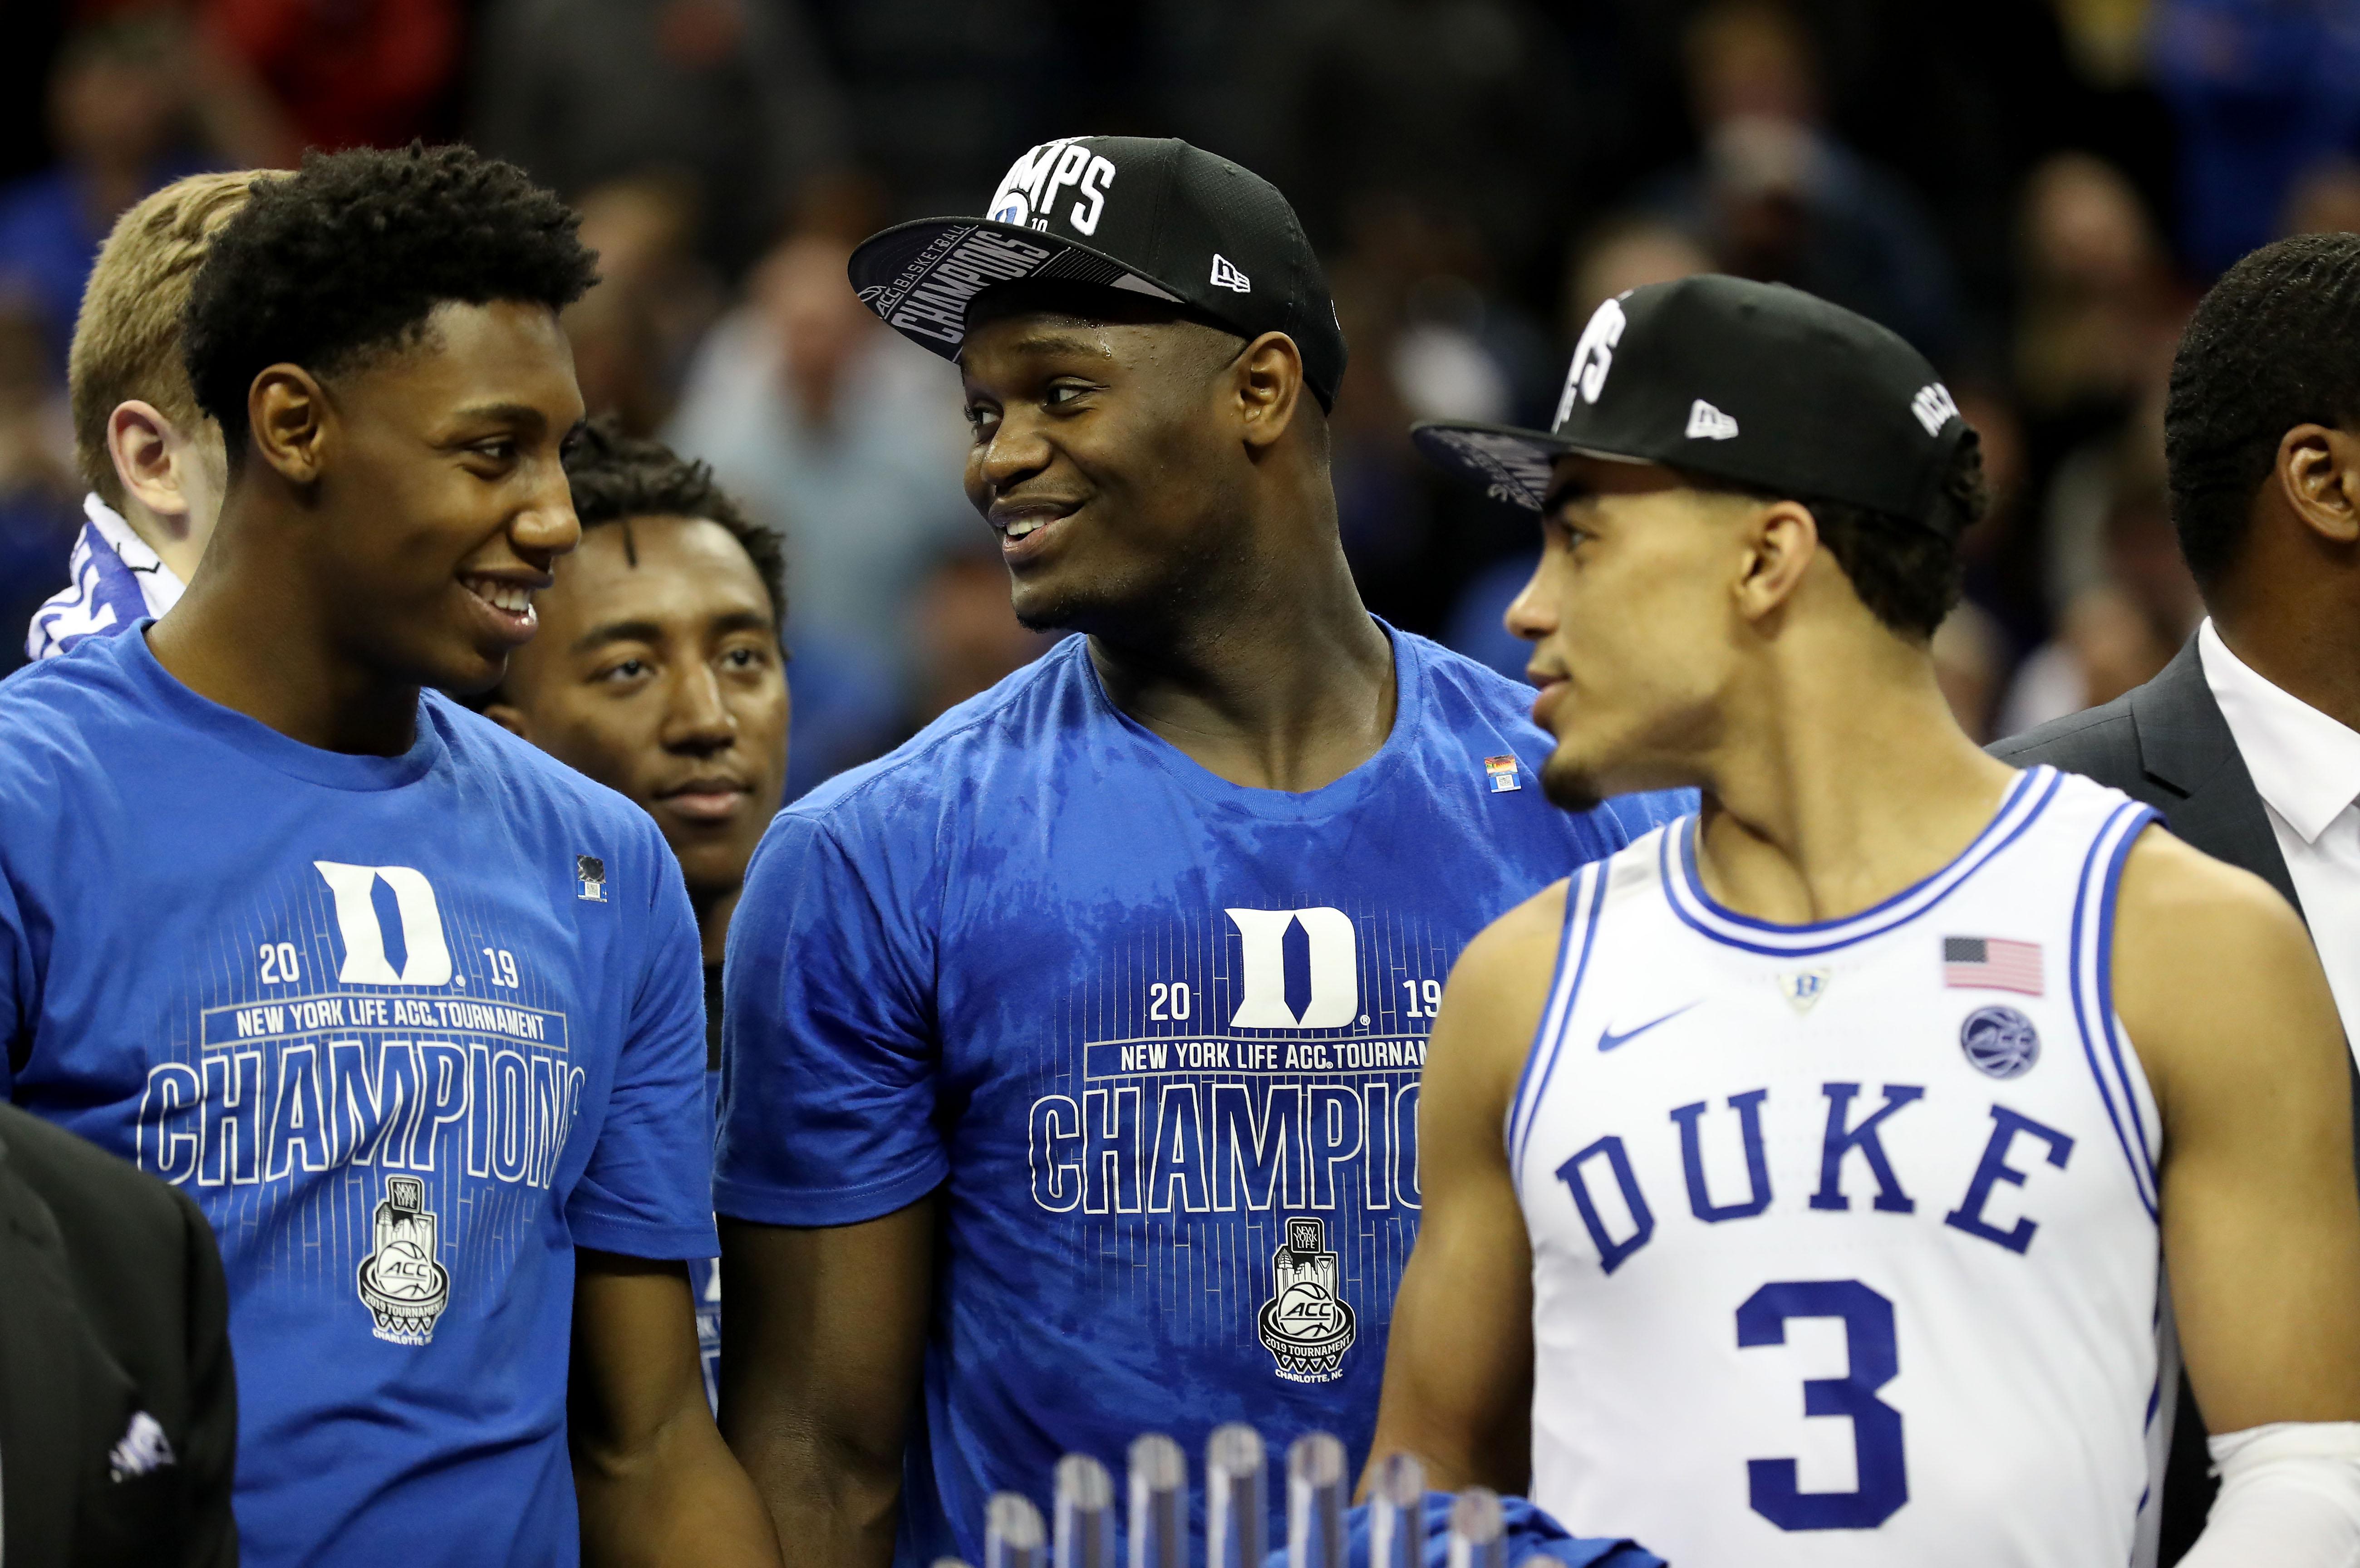 NCAA bracket No. 1 seeds: How Duke, UNC, UVA, Gonzaga got top spots